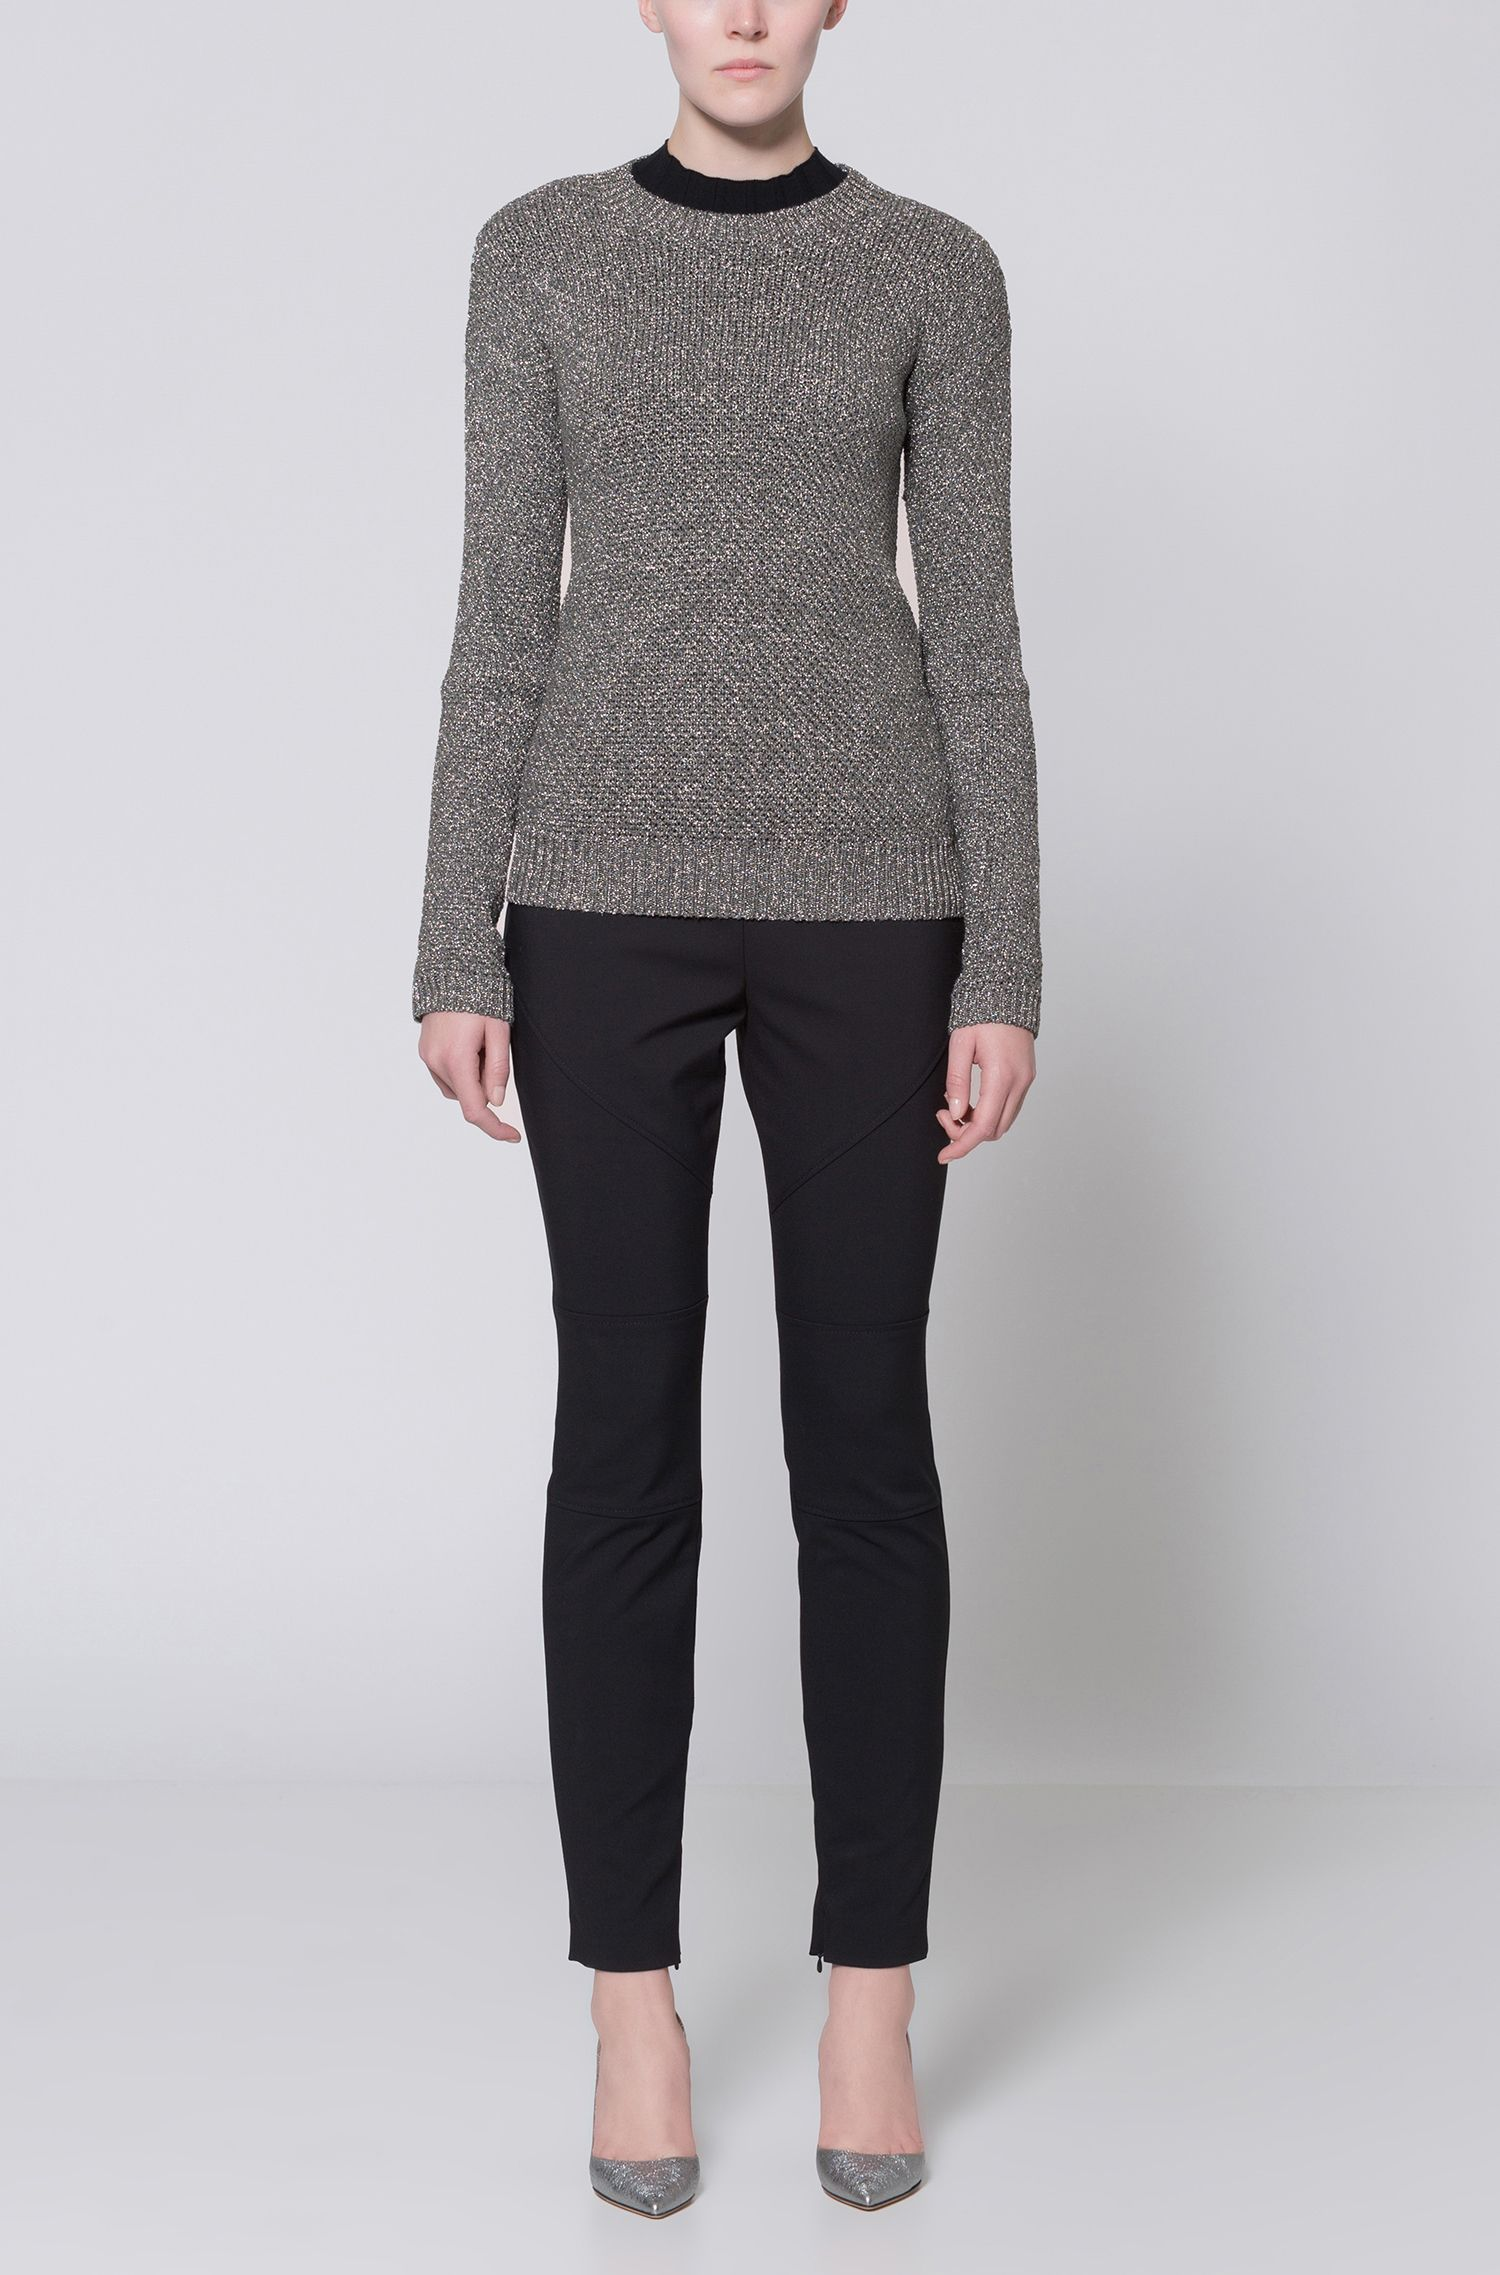 Honeycomb Knit Sweater | Sejena